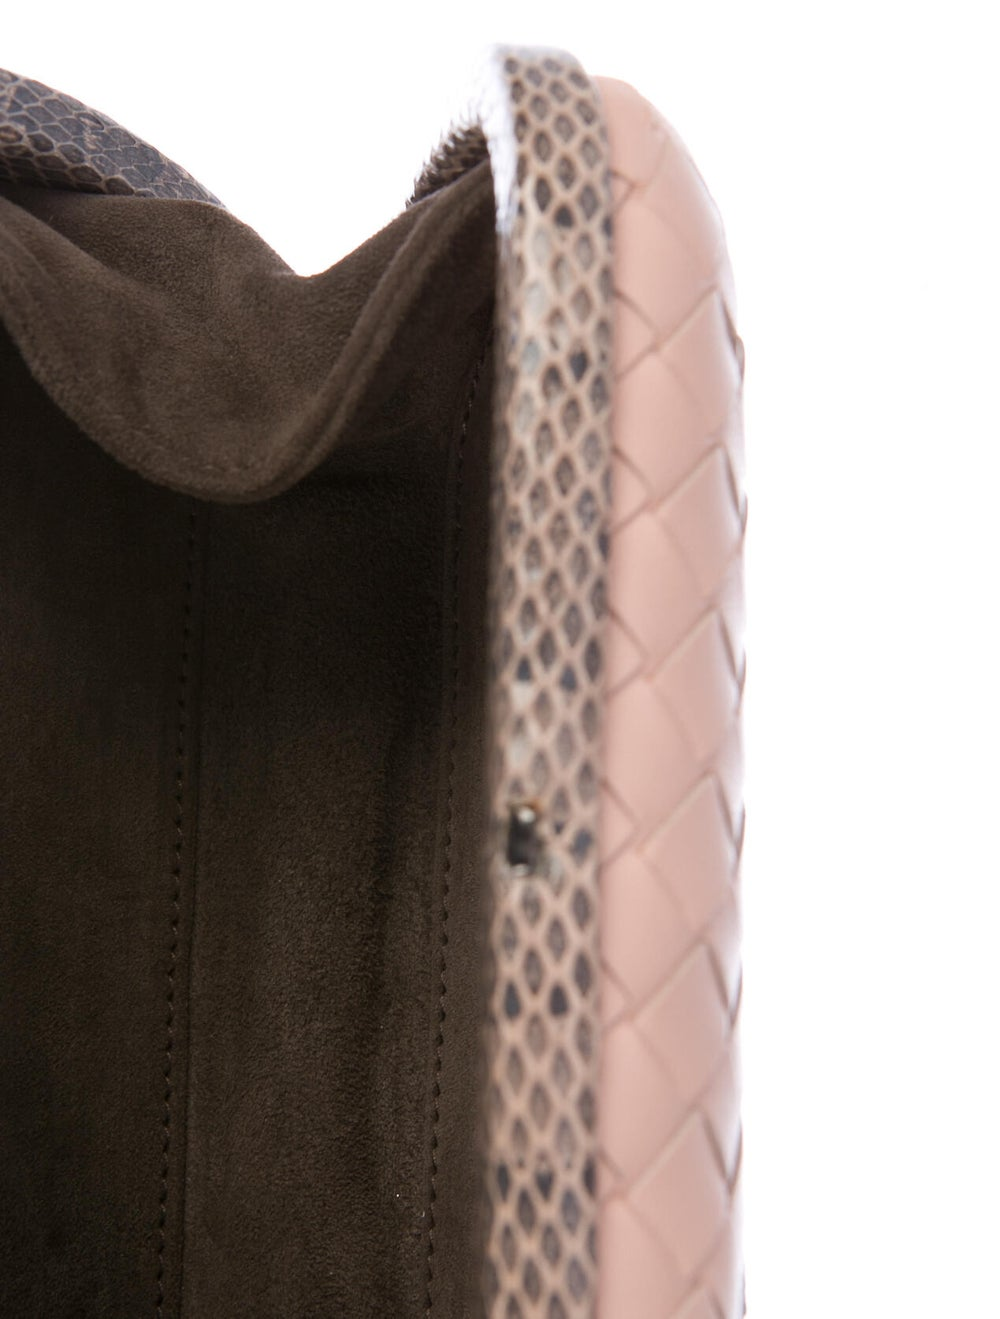 Bottega Veneta Ayers-Trimmed Box Clutch Pink - image 5